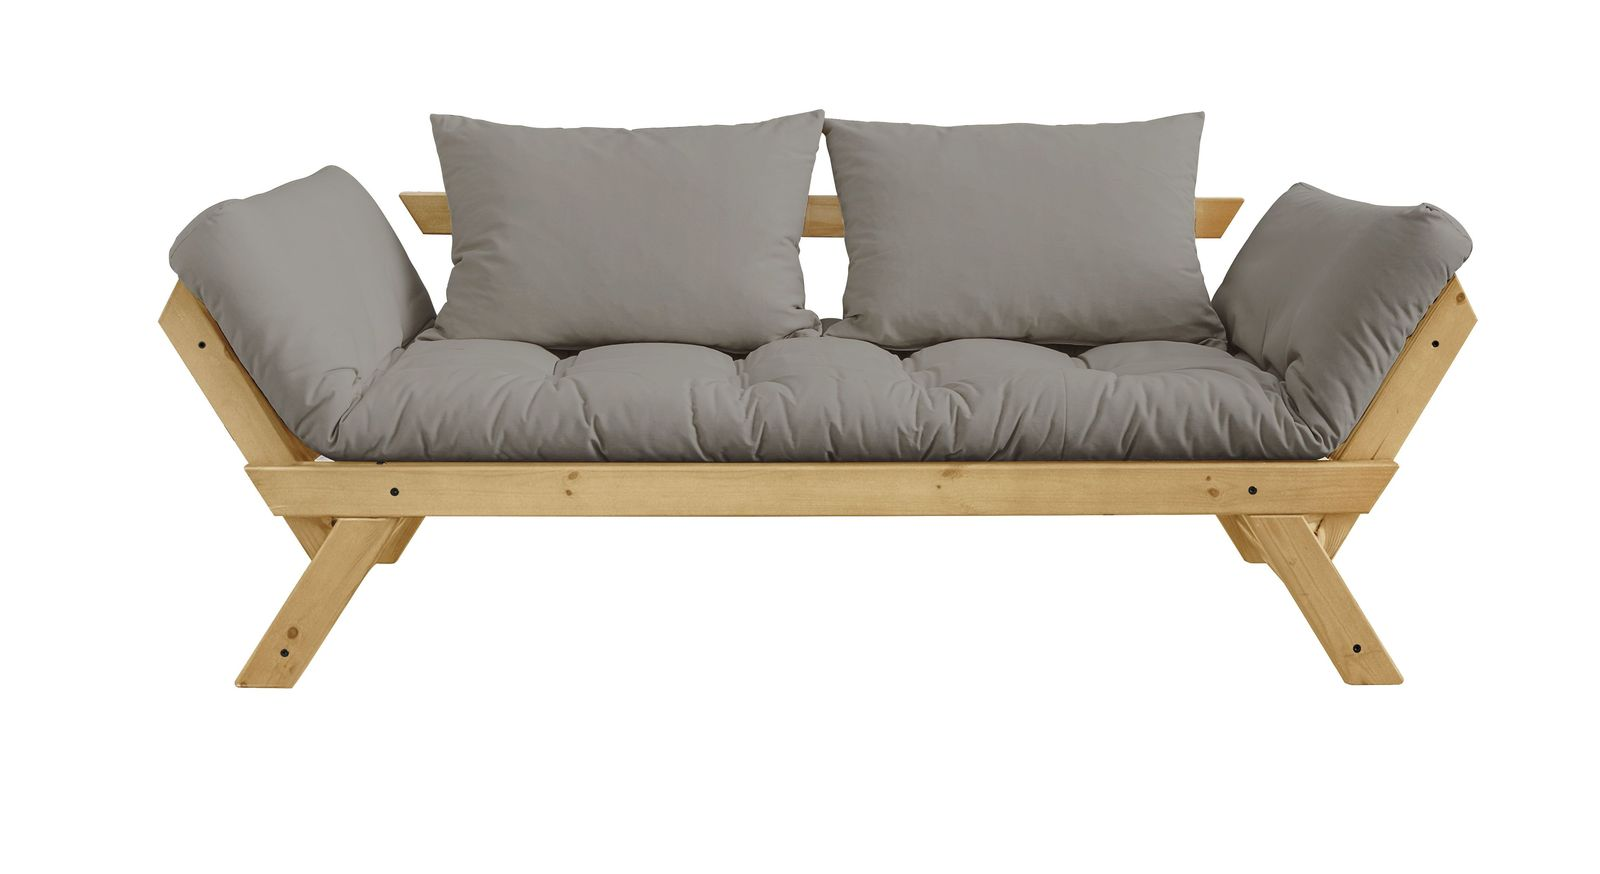 Modernes Futonsofa Gariana mit stylischem Holzgestell